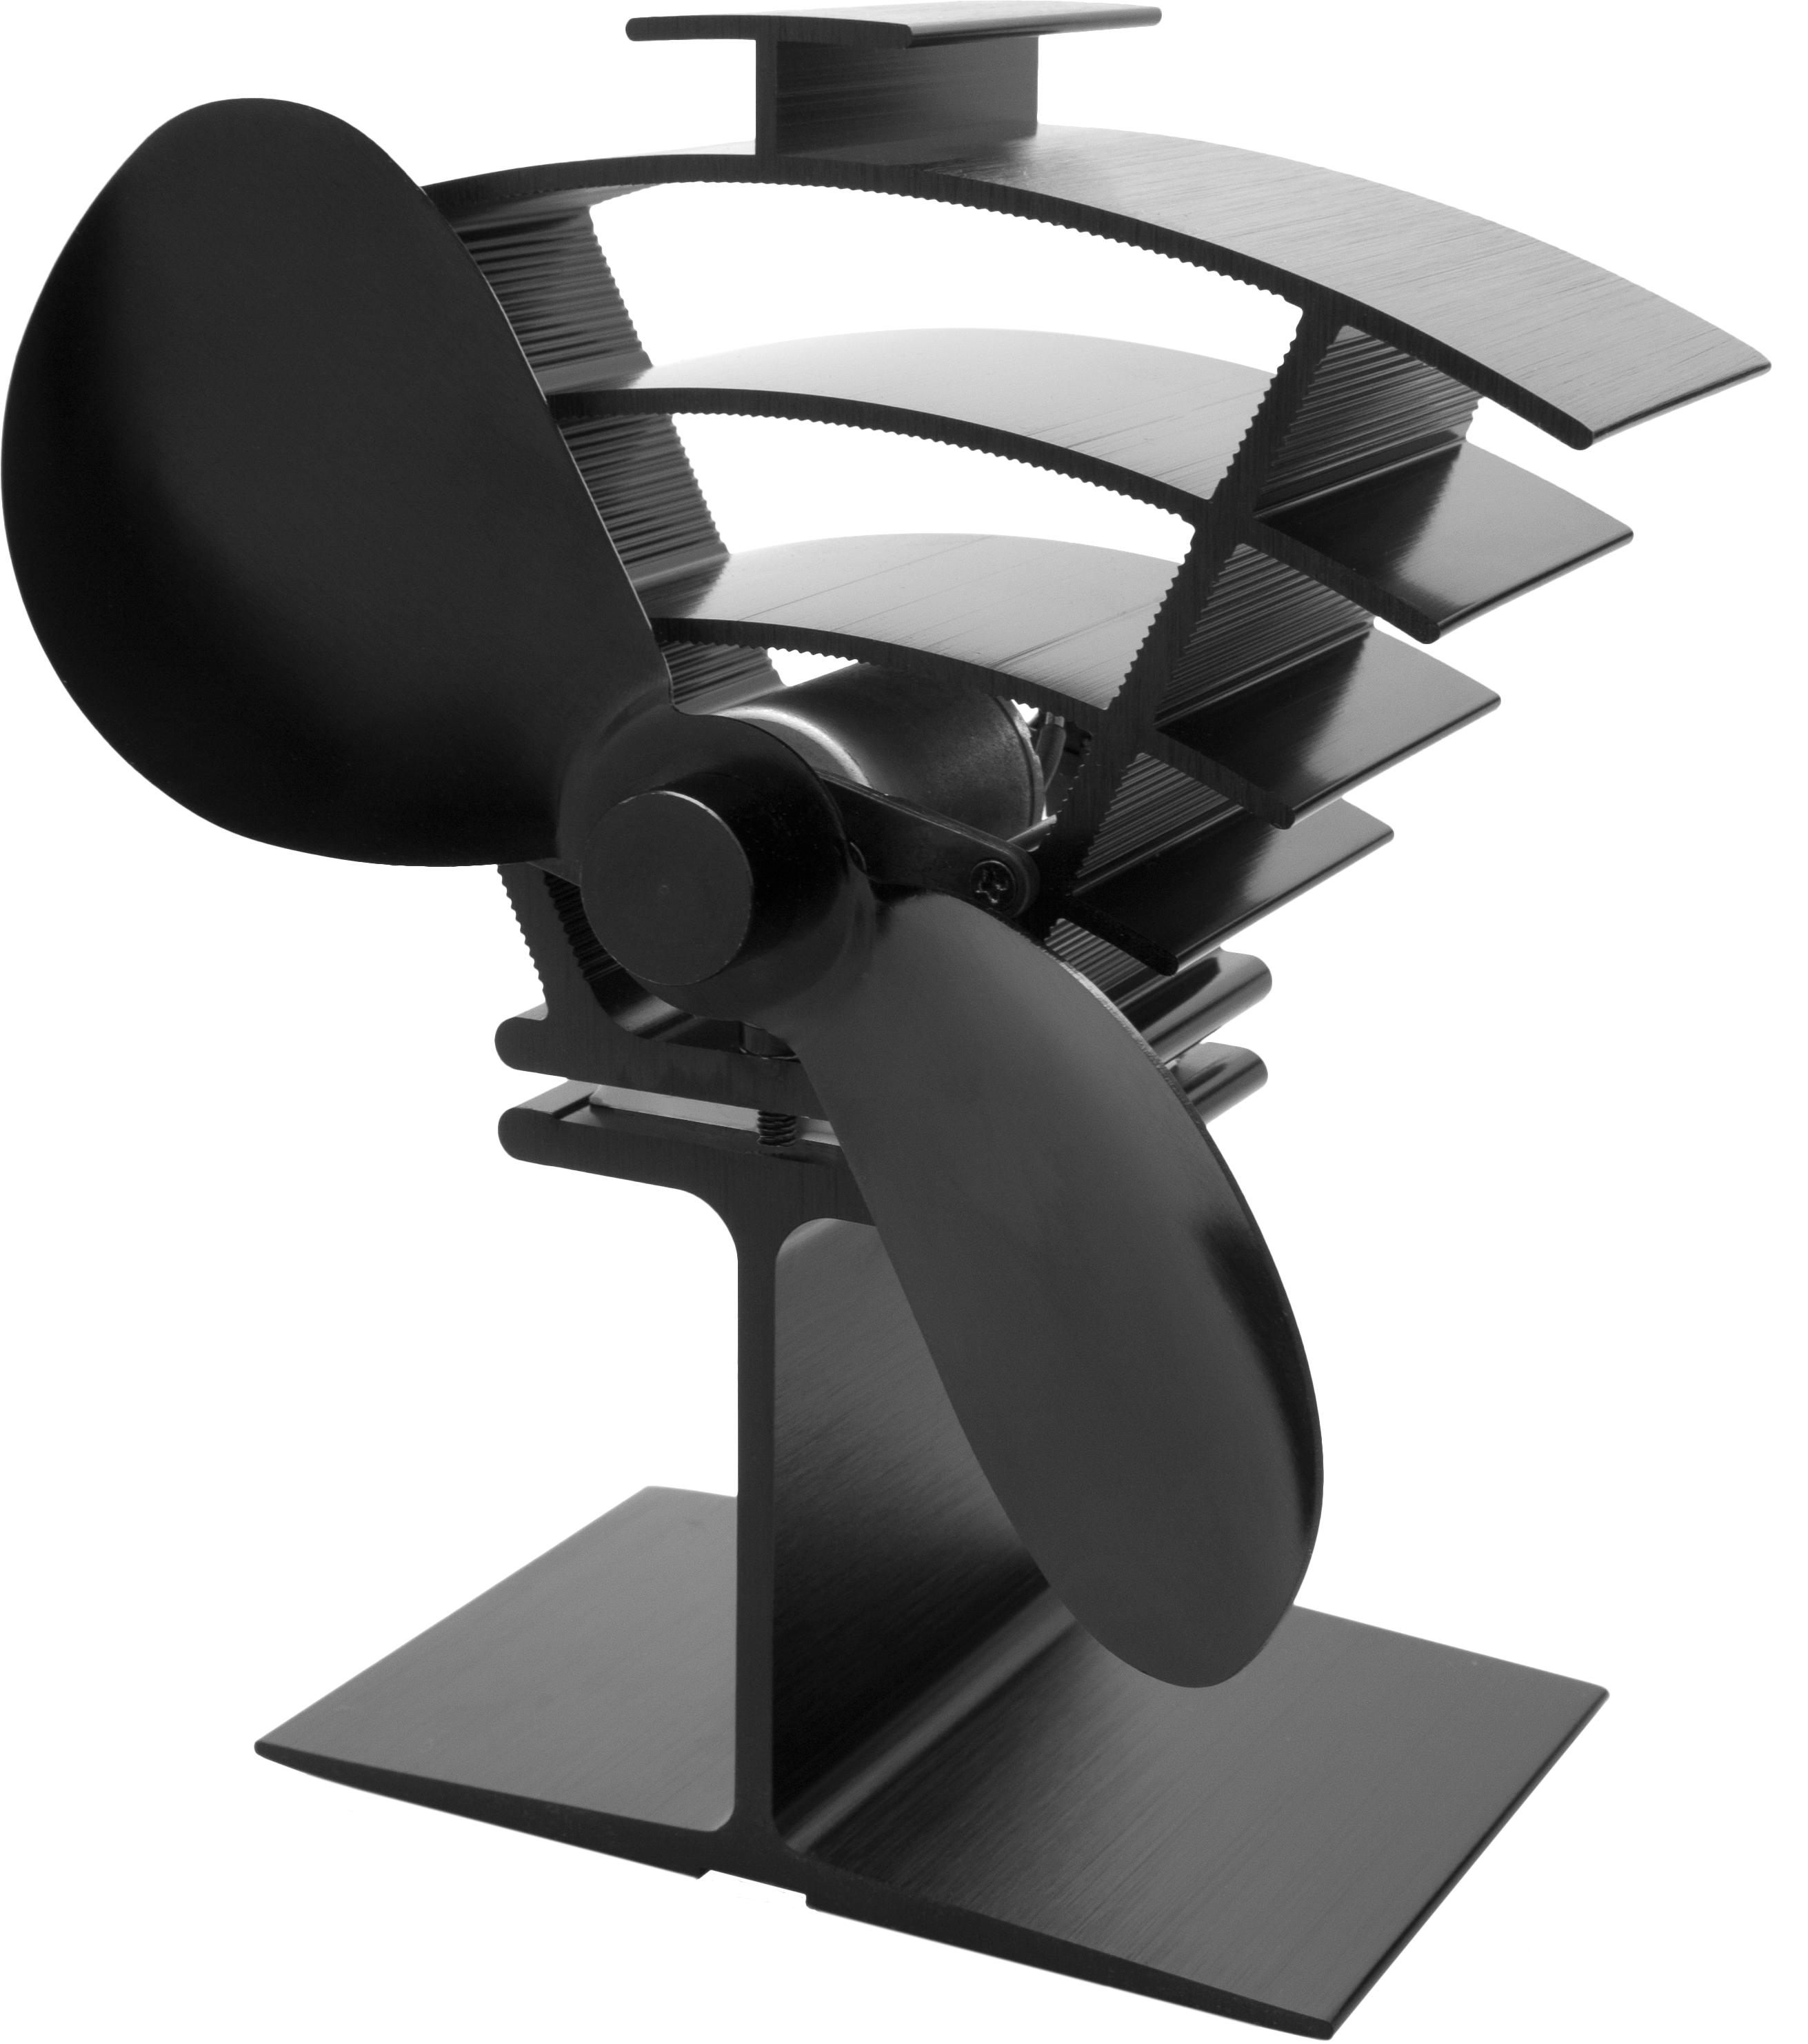 ventum ii kaminofen ventilator in schwarz von valiant f r holz fen. Black Bedroom Furniture Sets. Home Design Ideas